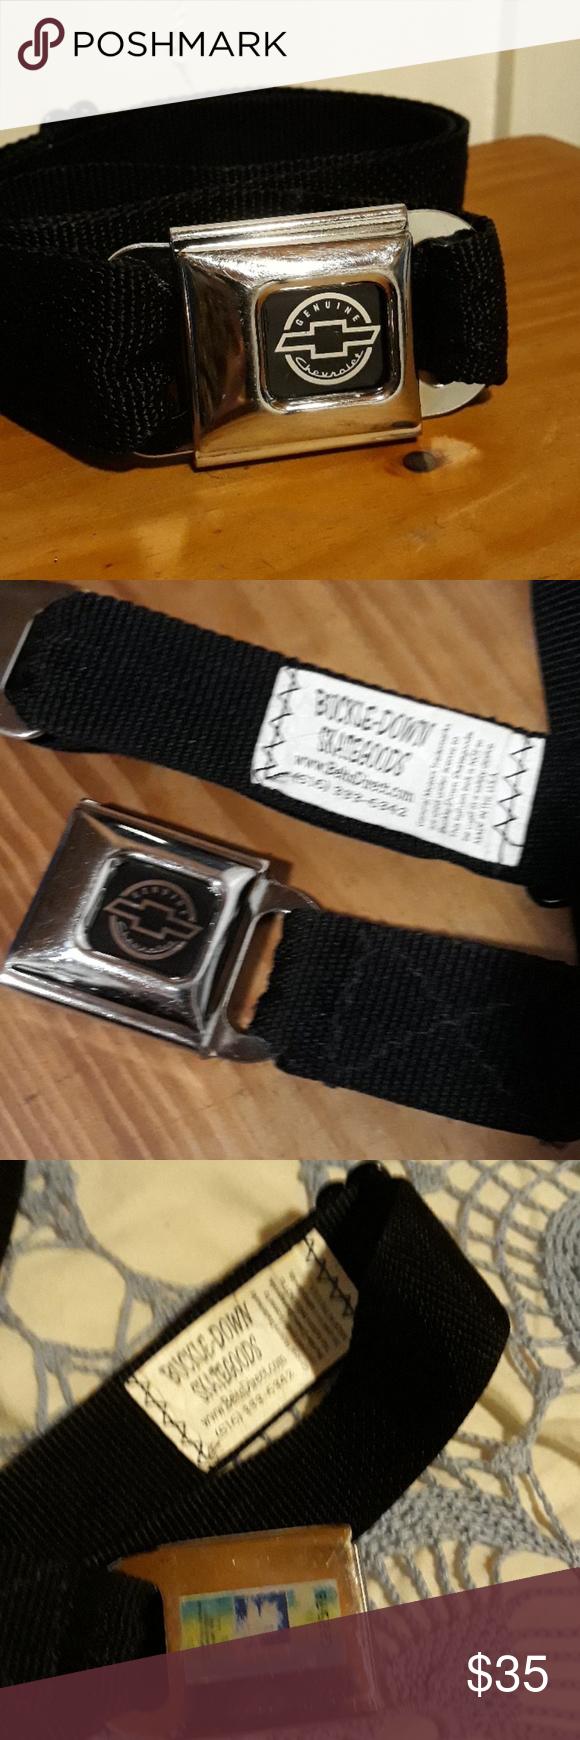 Original 1990 Chevrolet seat belt belt Original 1990 Chevy